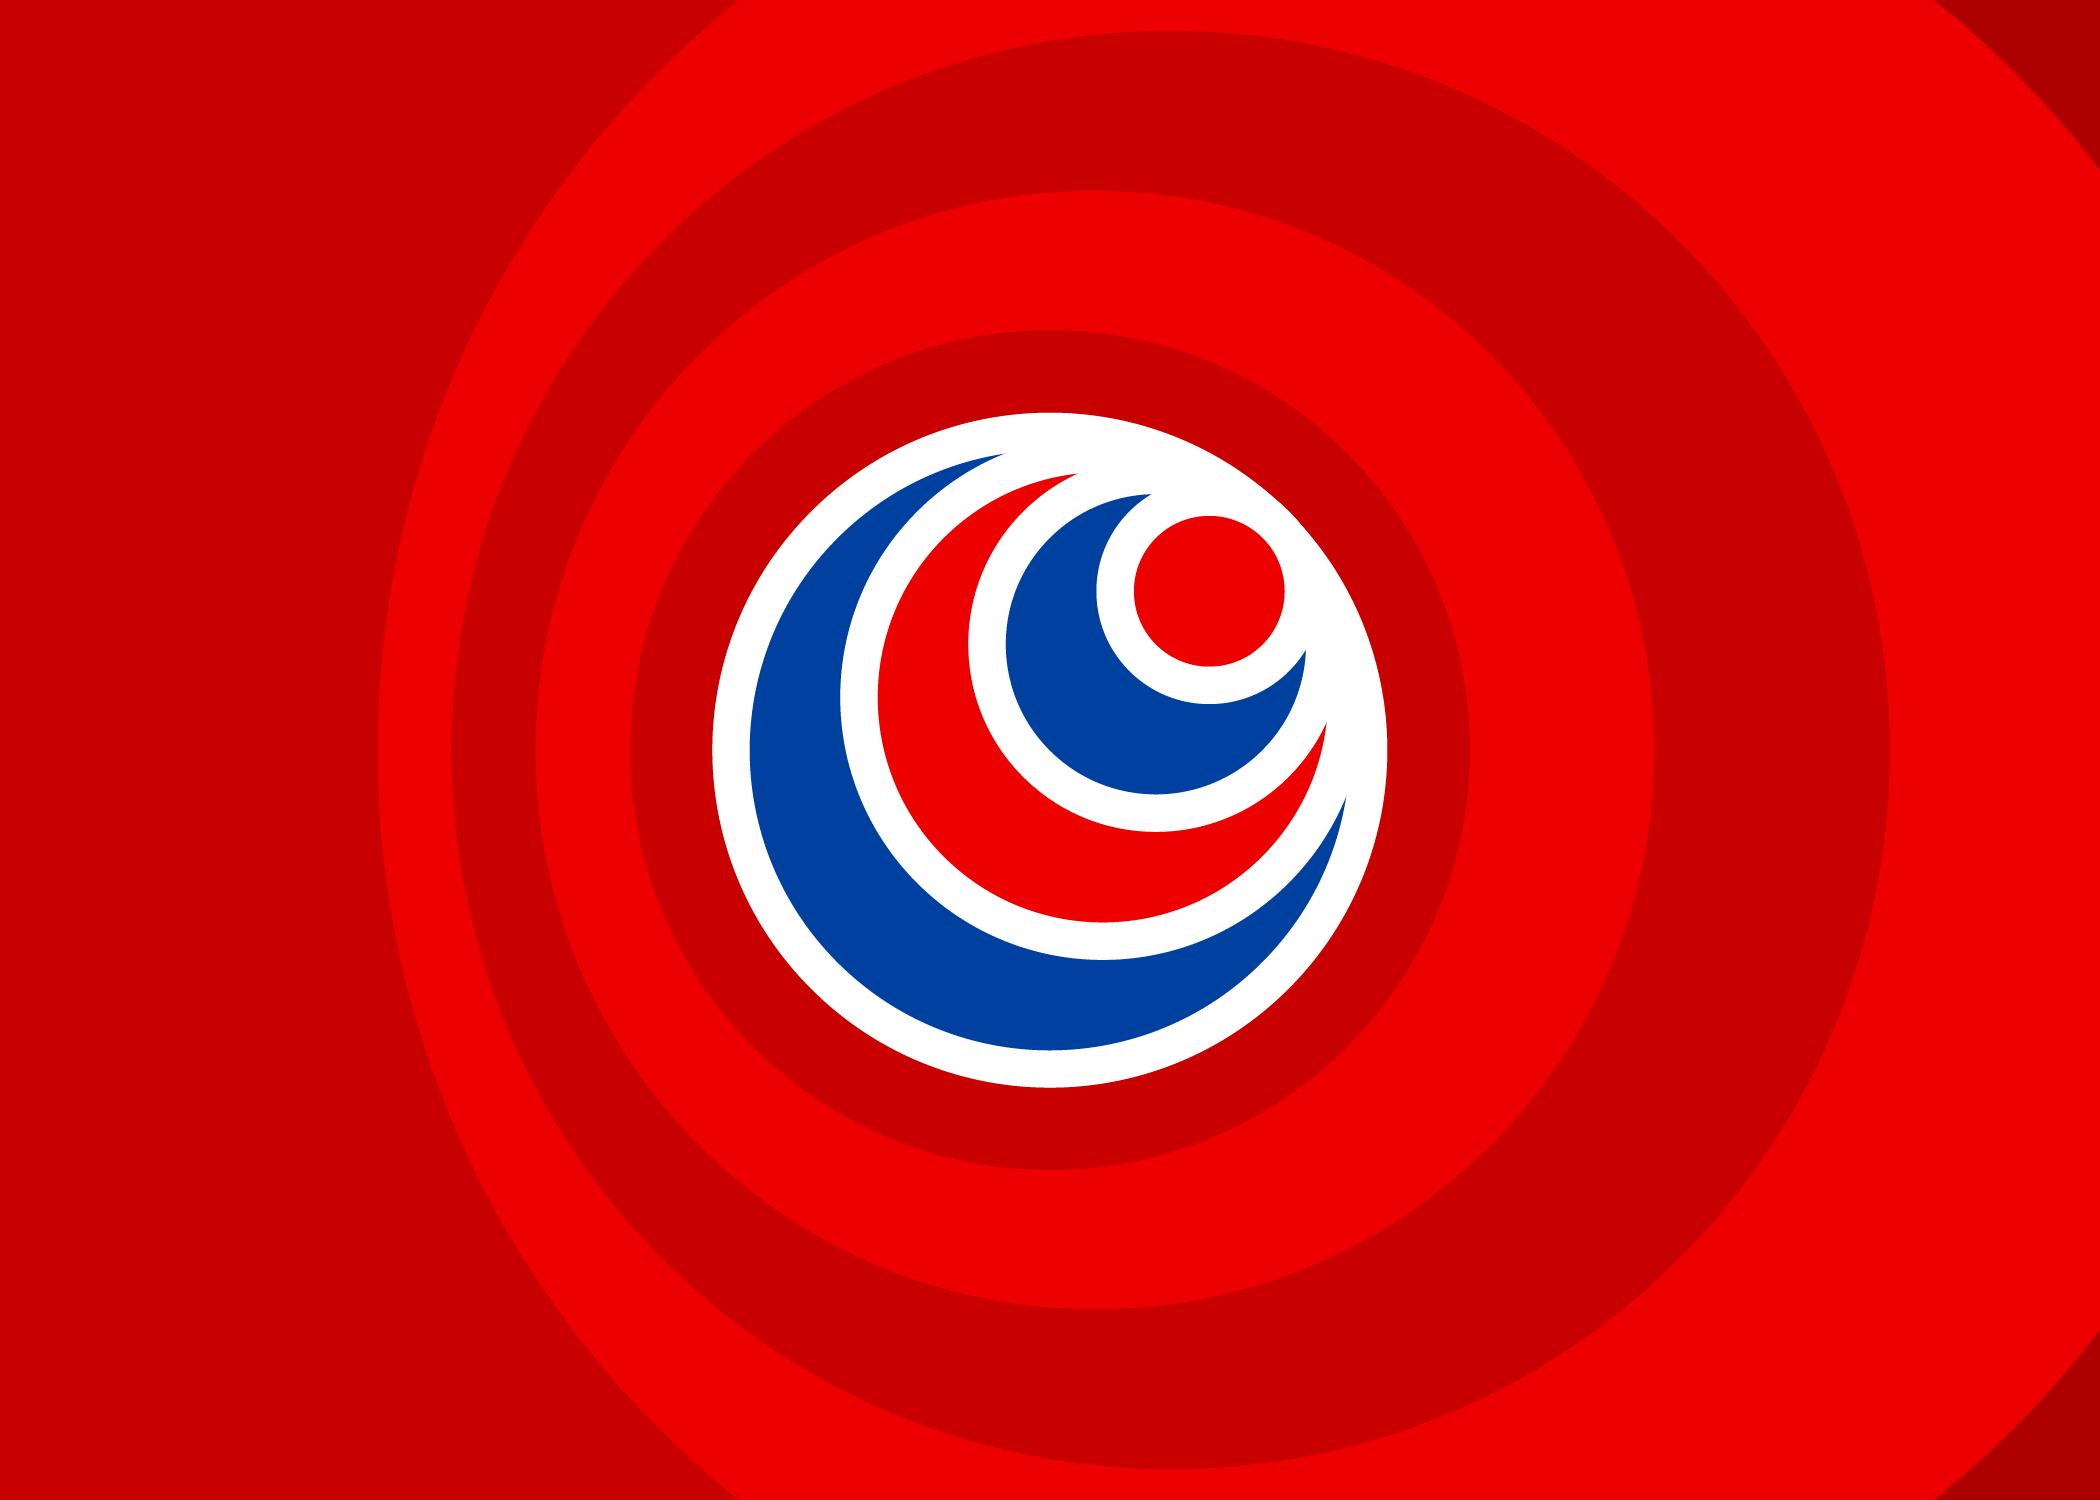 Costa-Rica-Geometric-World-Cup-Football-Badge-01-Logo-Design-Freelance-Kent.png